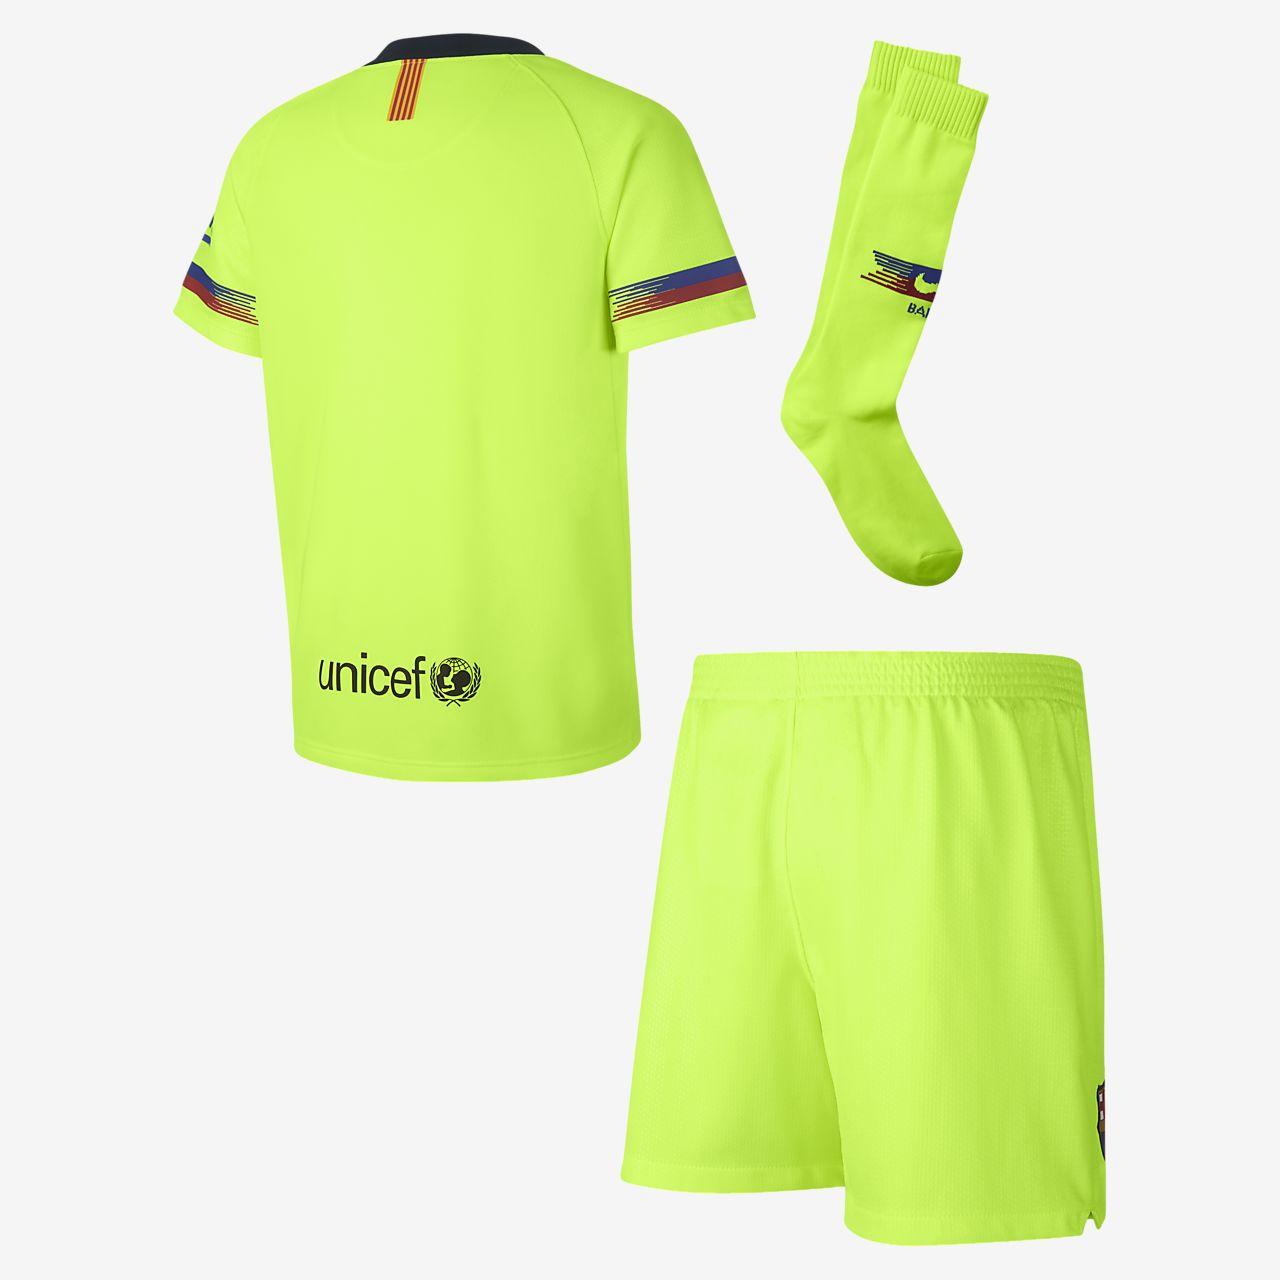 d449b9299 2018 19 FC Barcelona Stadium Away Younger Kids  Football Kit. Nike ...